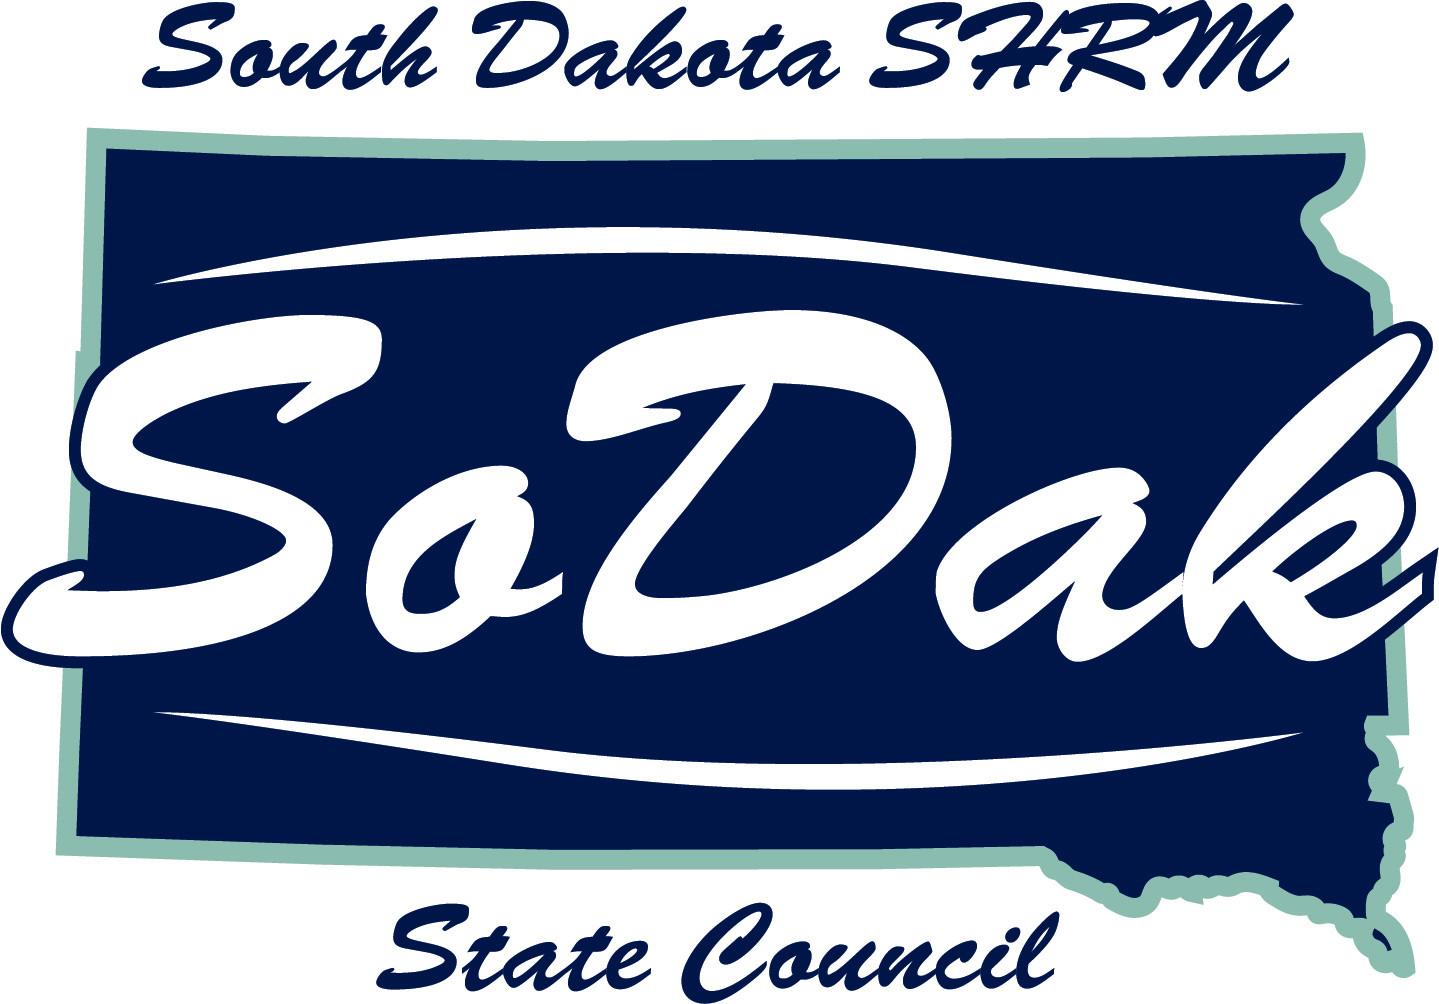 Home | South Dakota SHRM